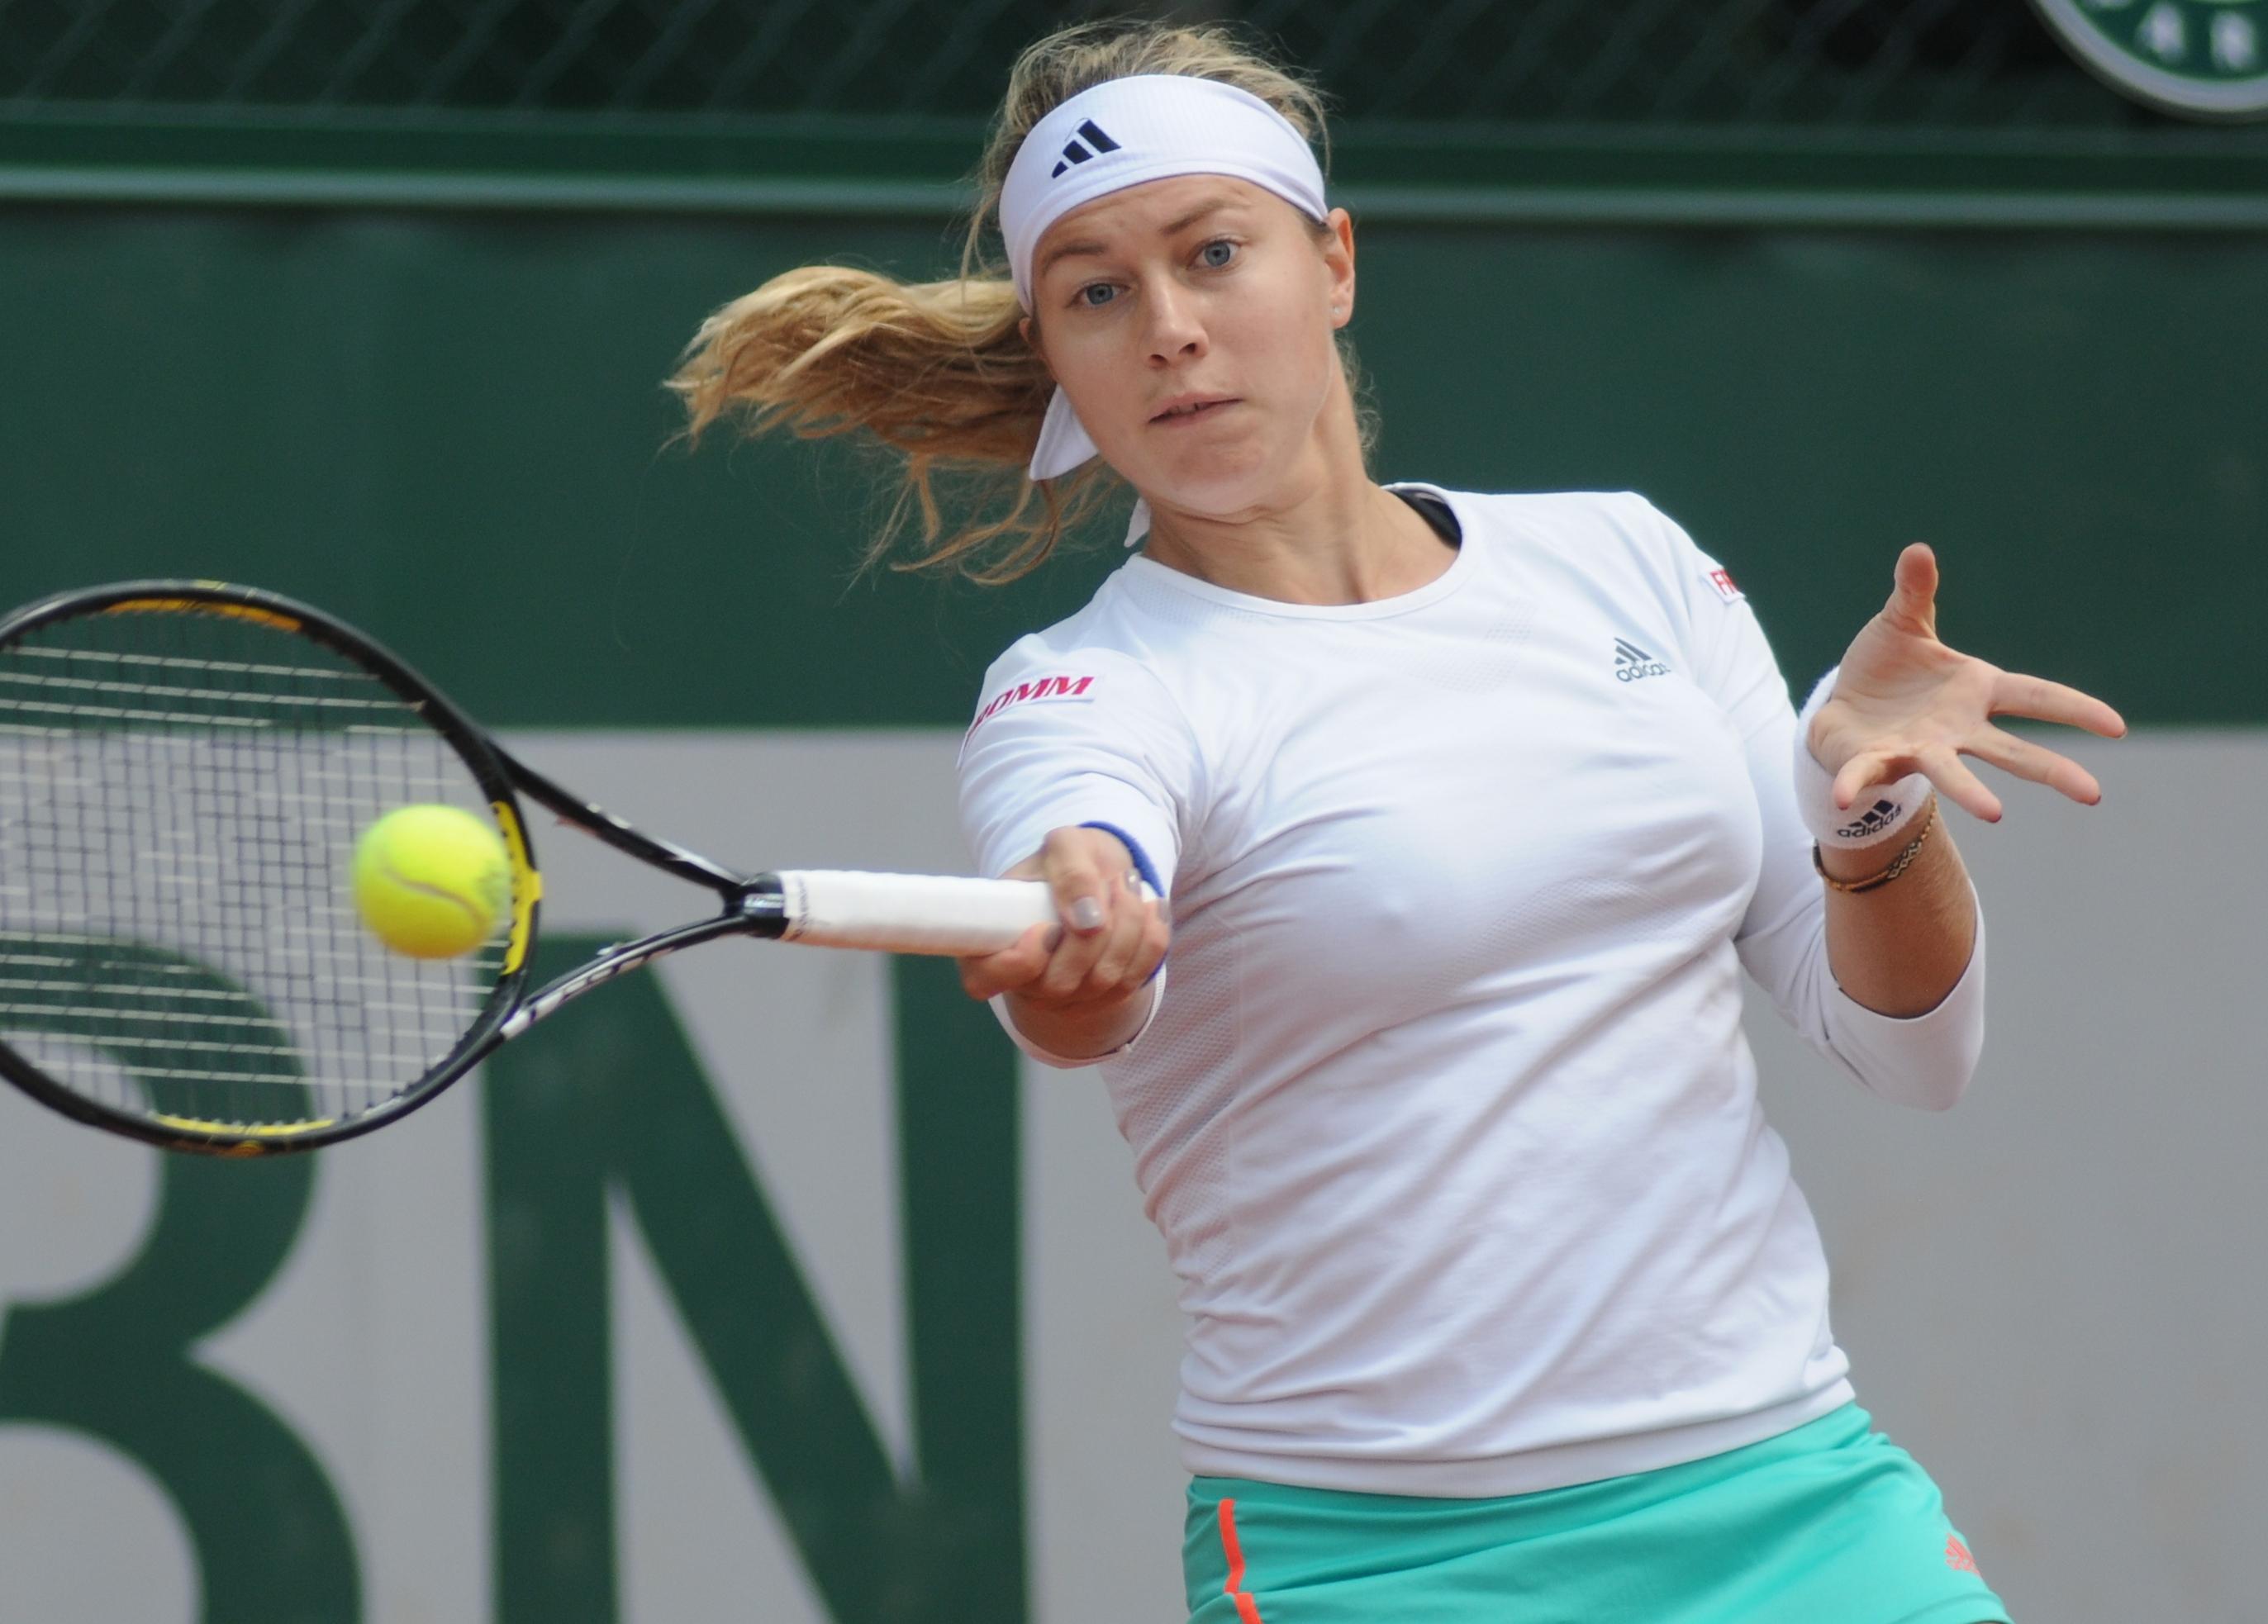 WTA Charleston winner odds